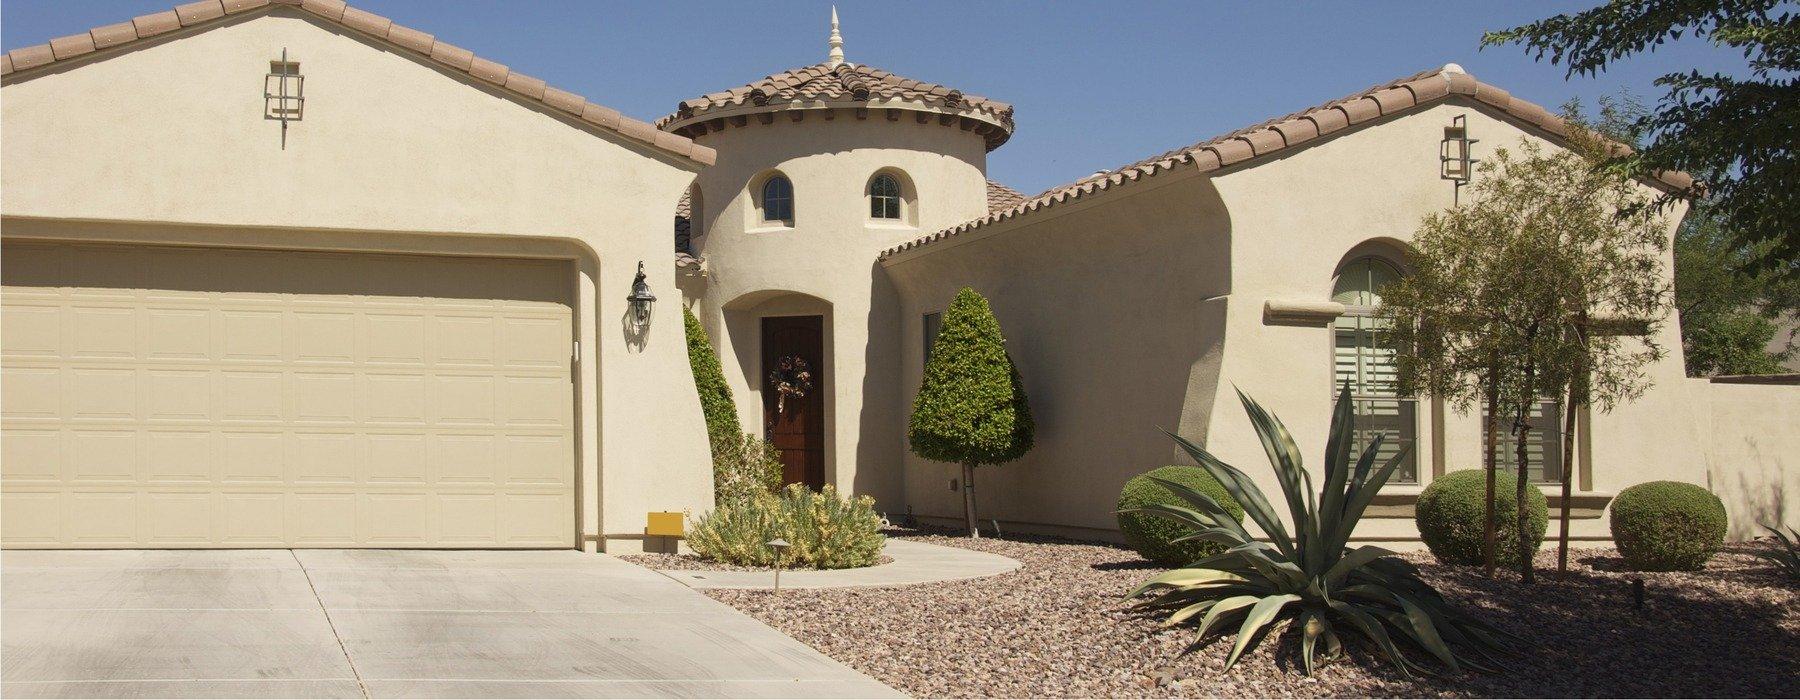 Fiberglass Windows in Arizona